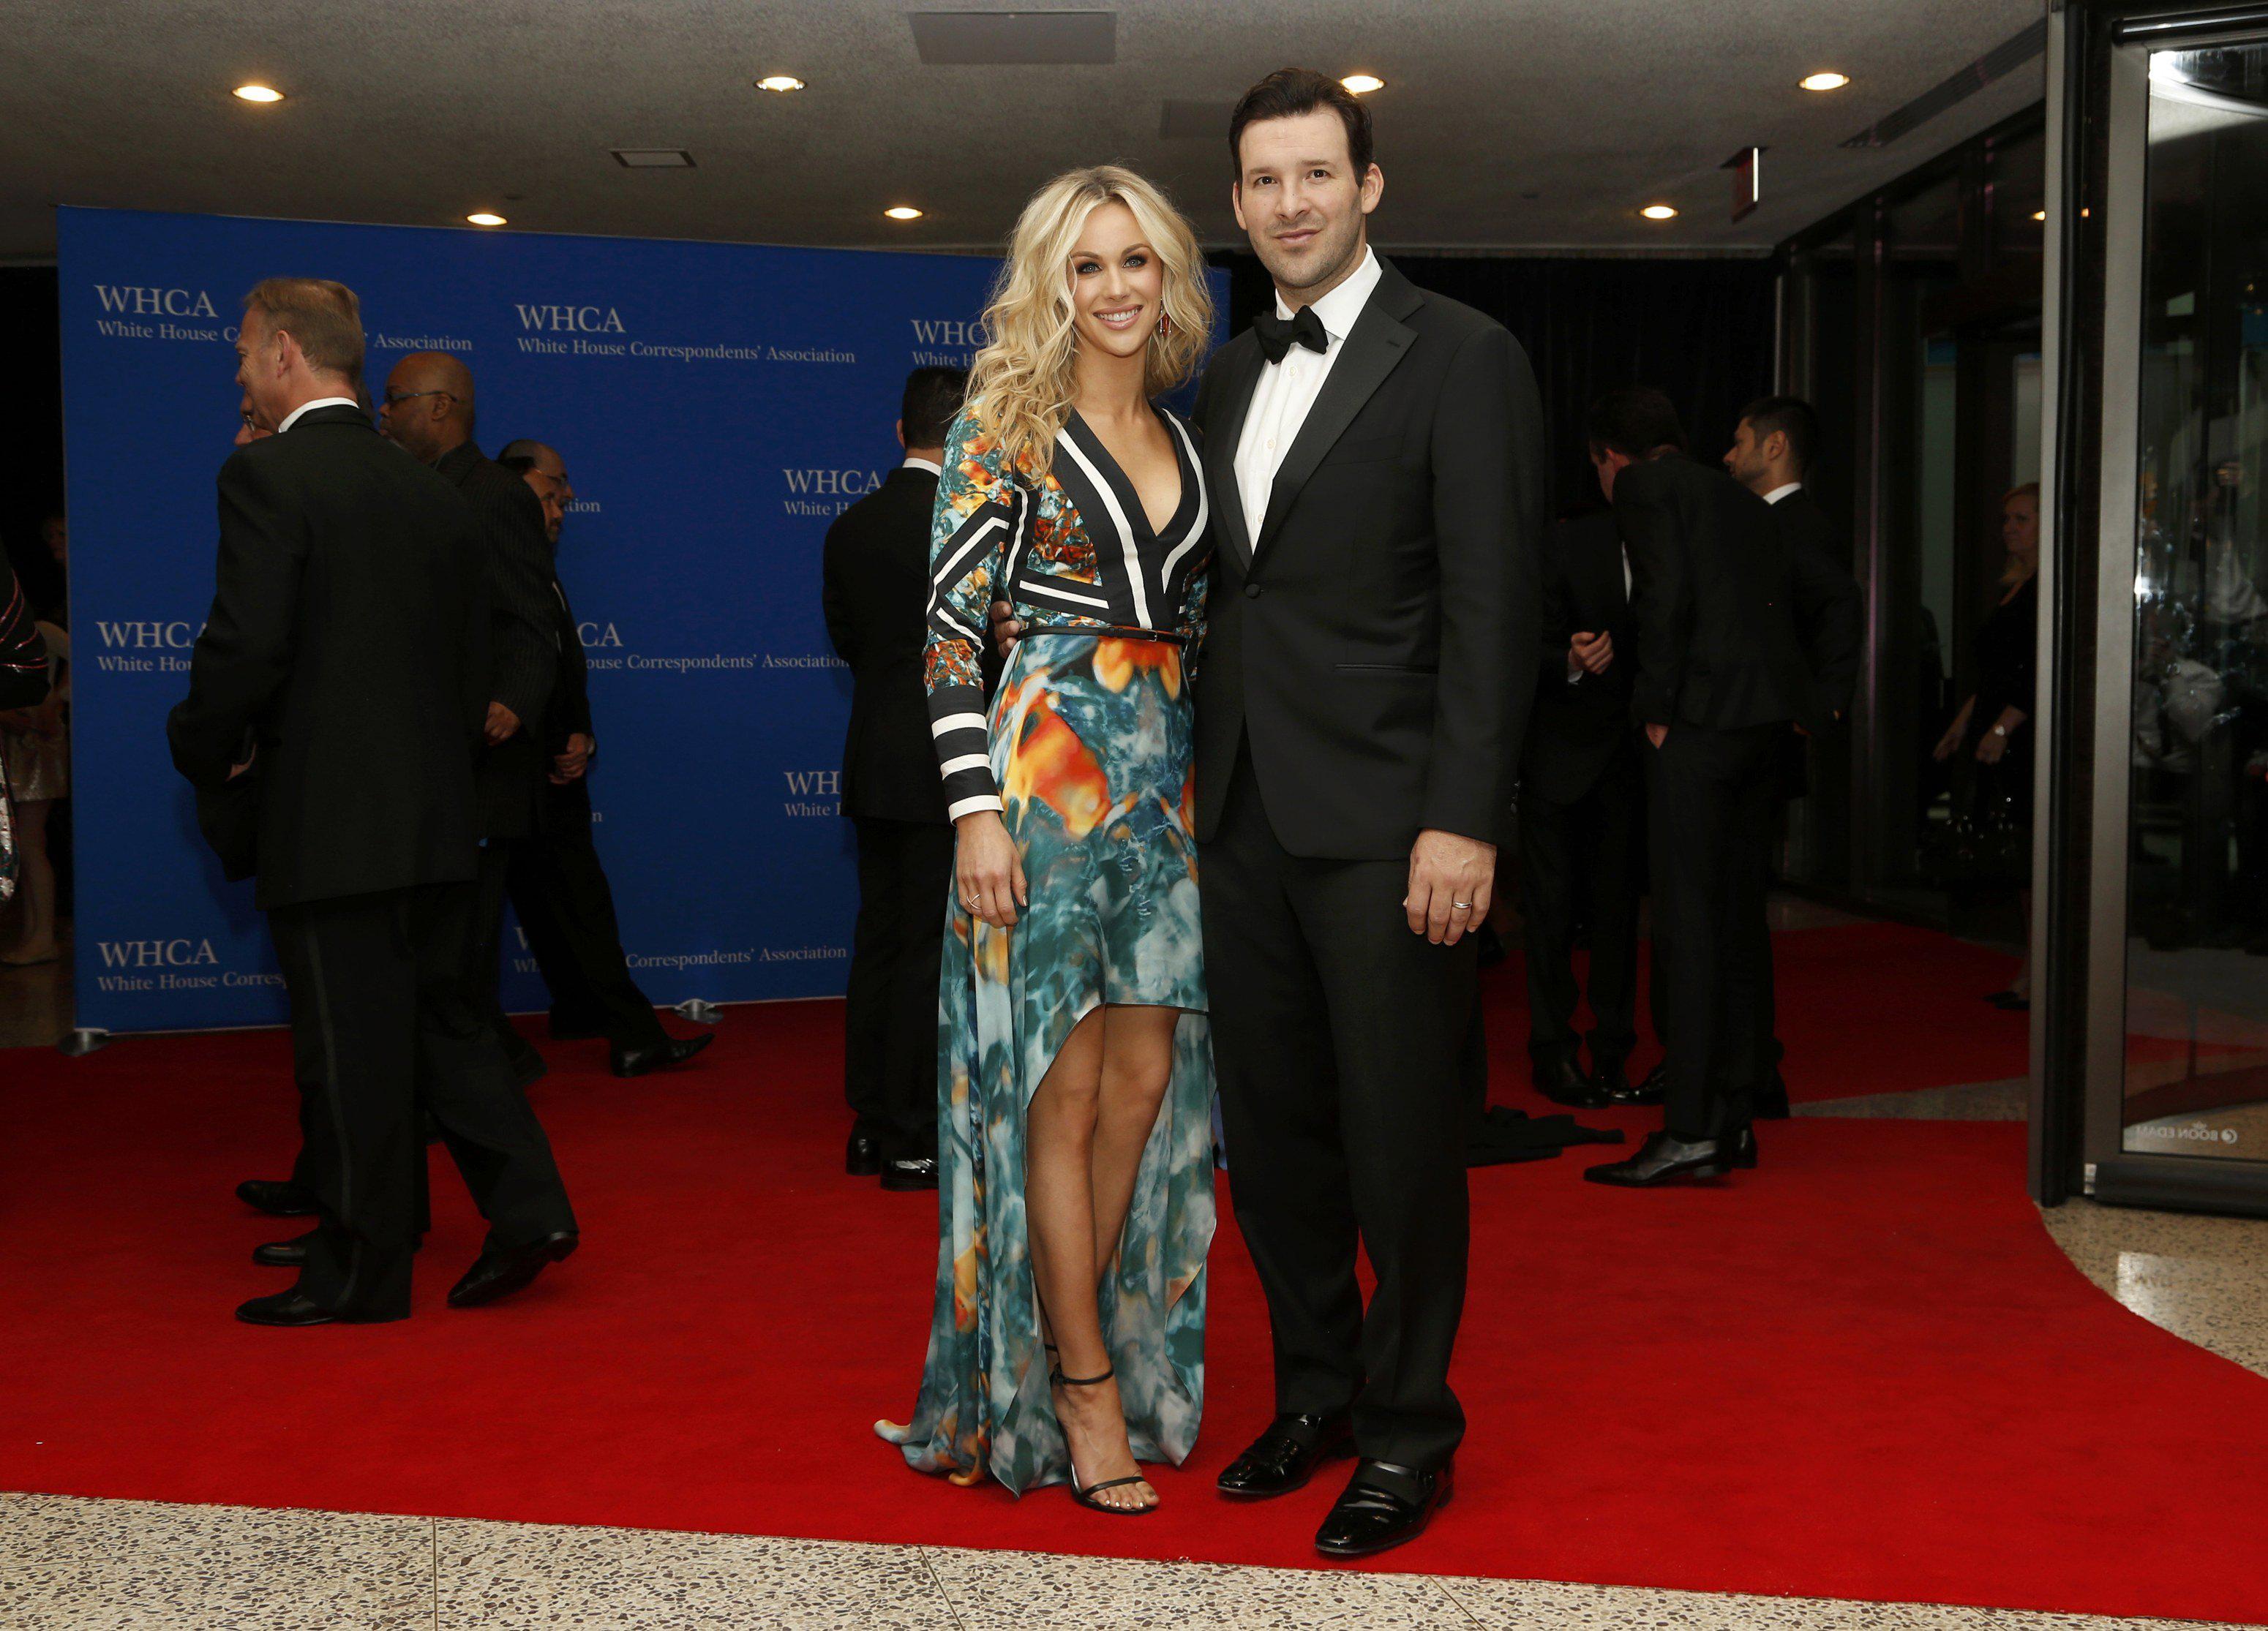 Dallas Cowboys quarterback Tony Romo and his wife, Candice.